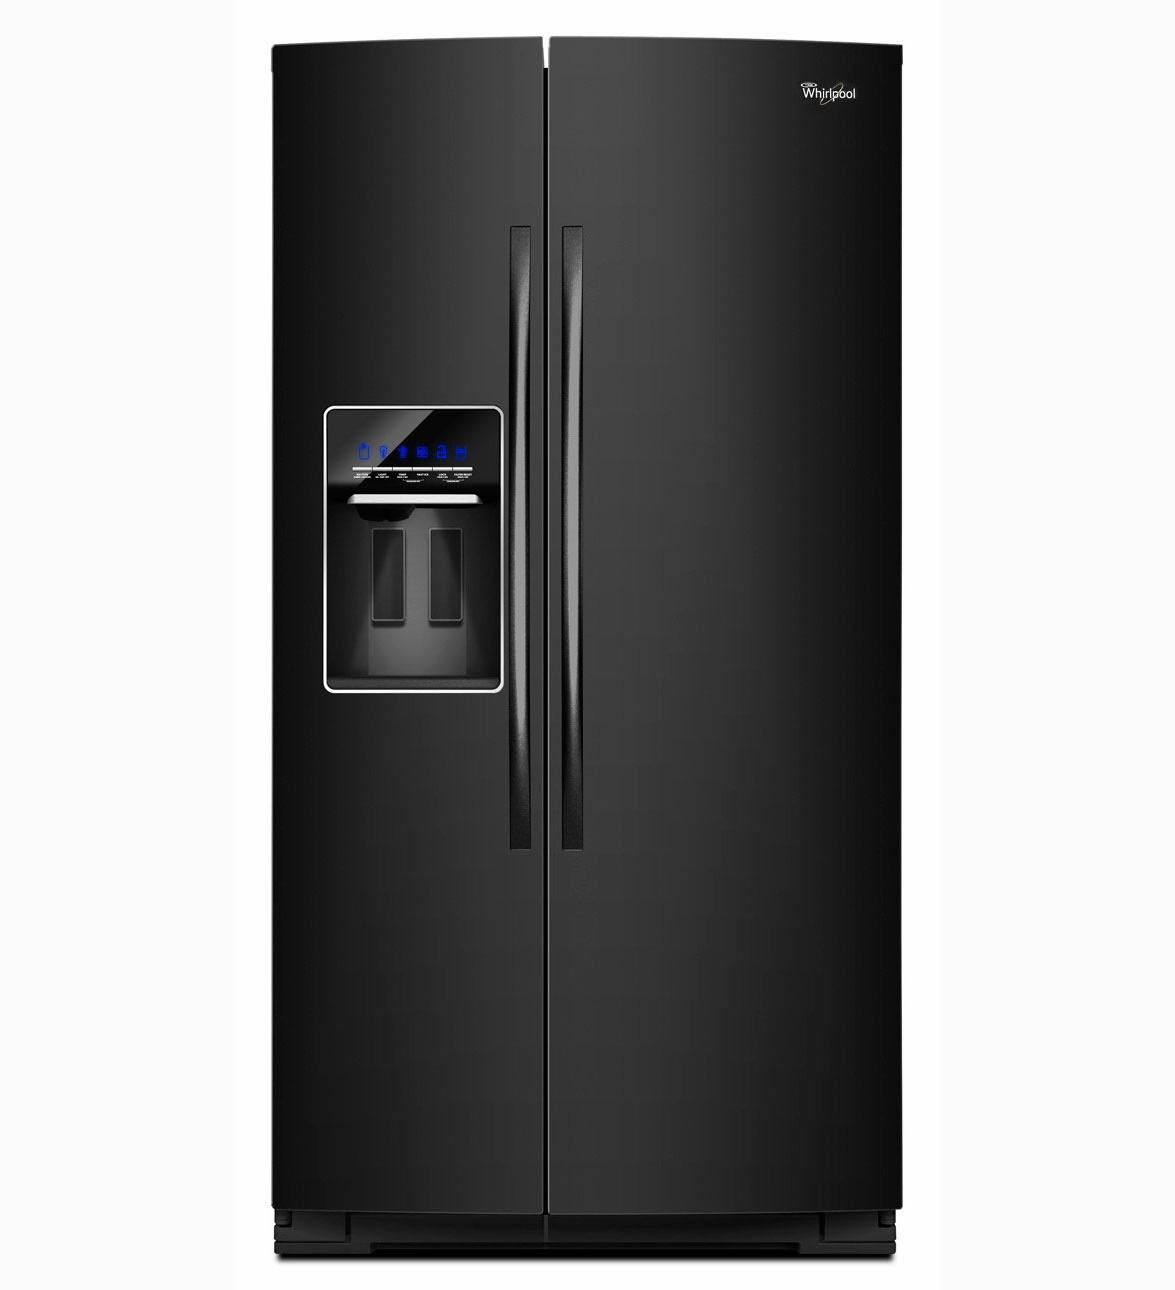 Whirlpool Refrigerator Brand Black Gsc25c6eyb Refrigerator